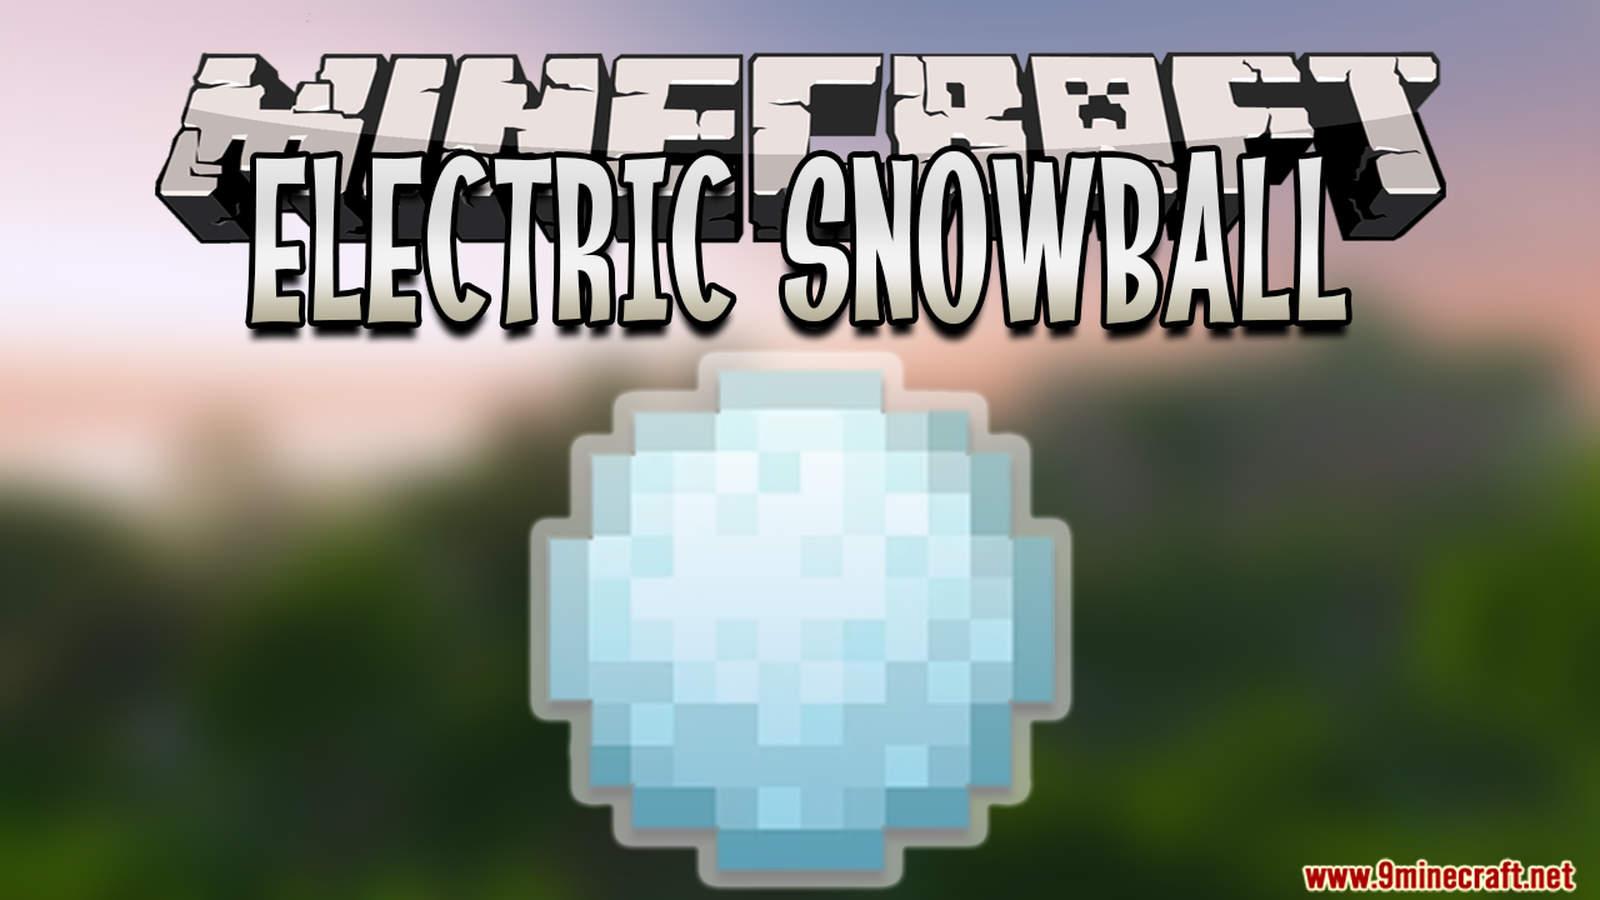 Electric Snowball Data Pack Thumbnail